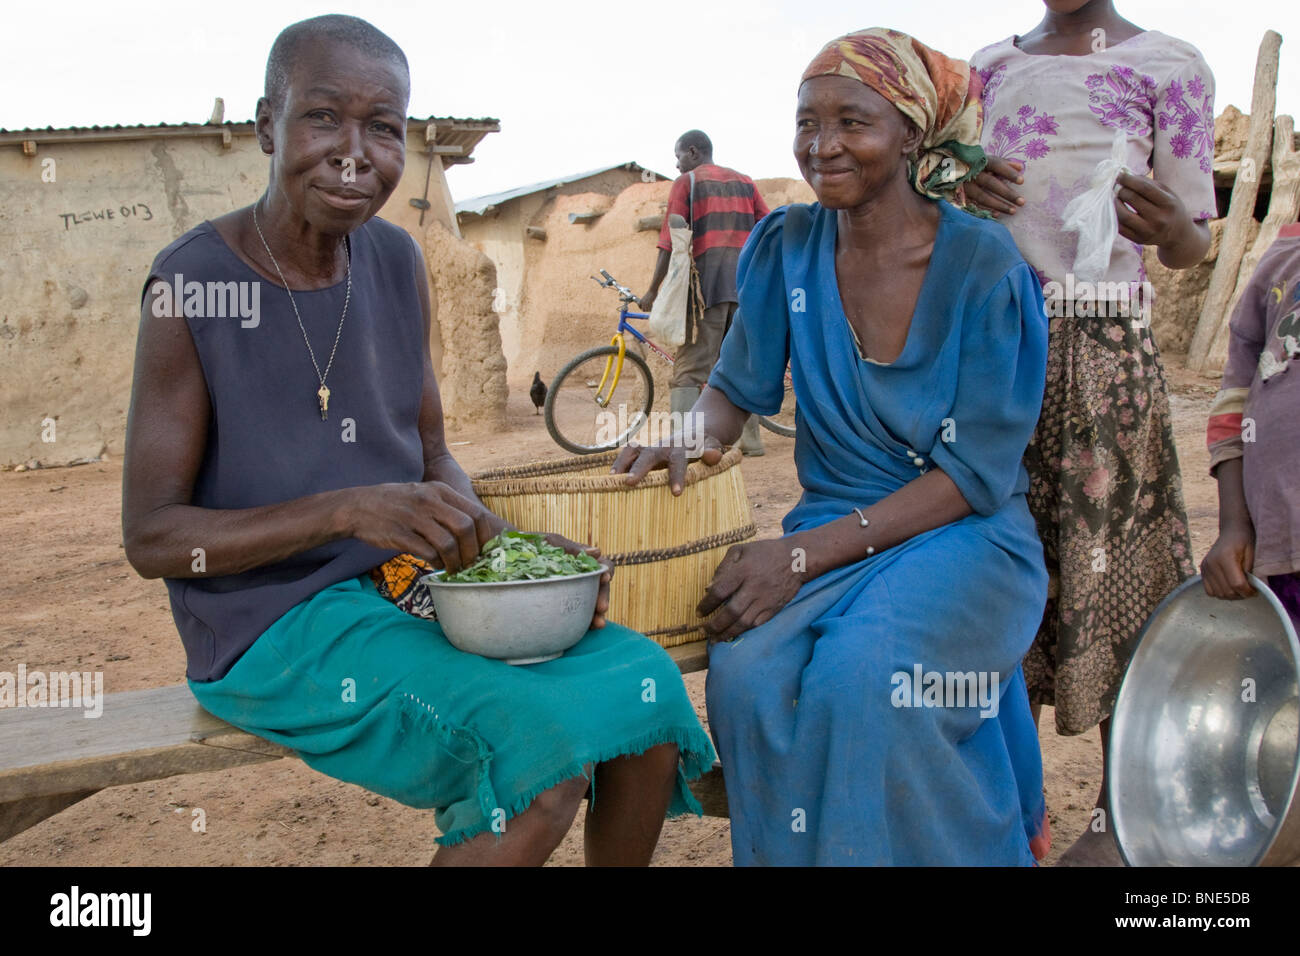 Lobi women preparing the evening meal, from Talawona, near Wechiau, Ghana. - Stock Image